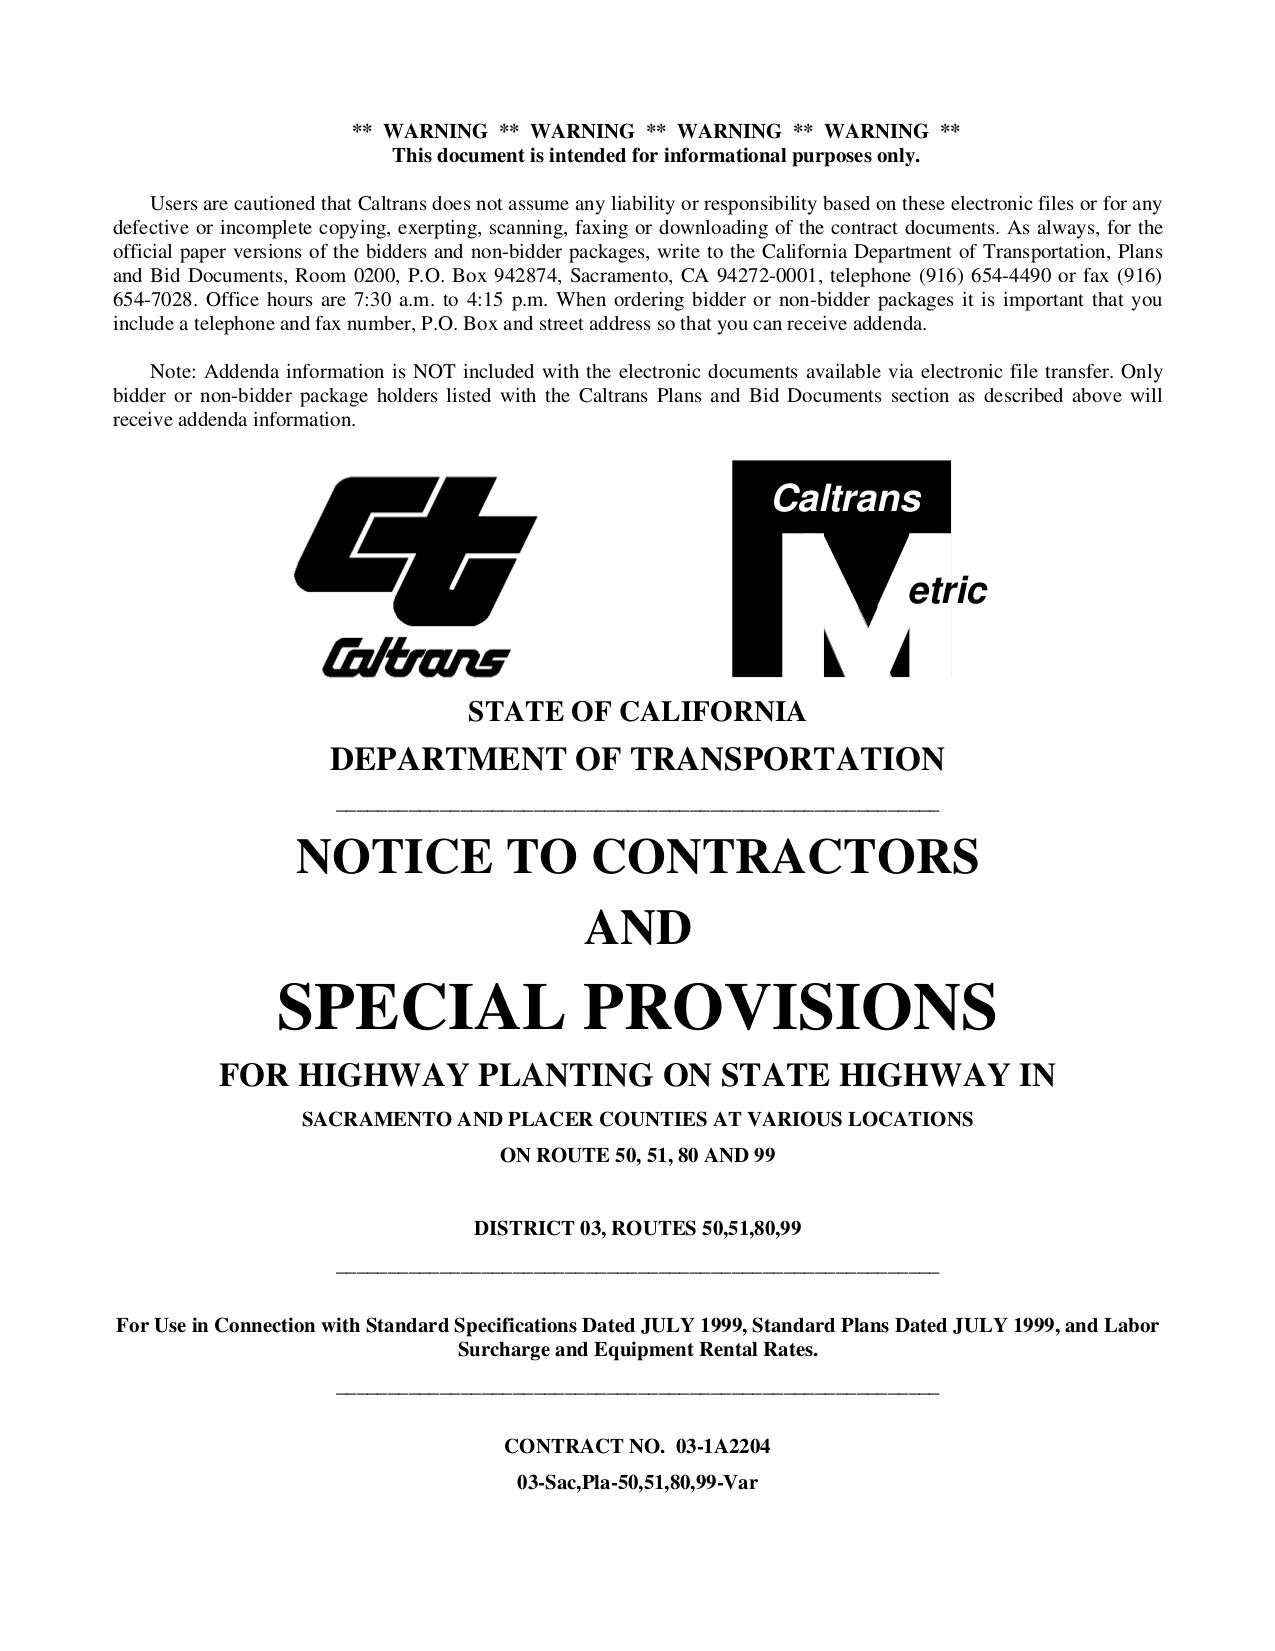 Download free pdf for NEC AccuSync 700 Monitor manual